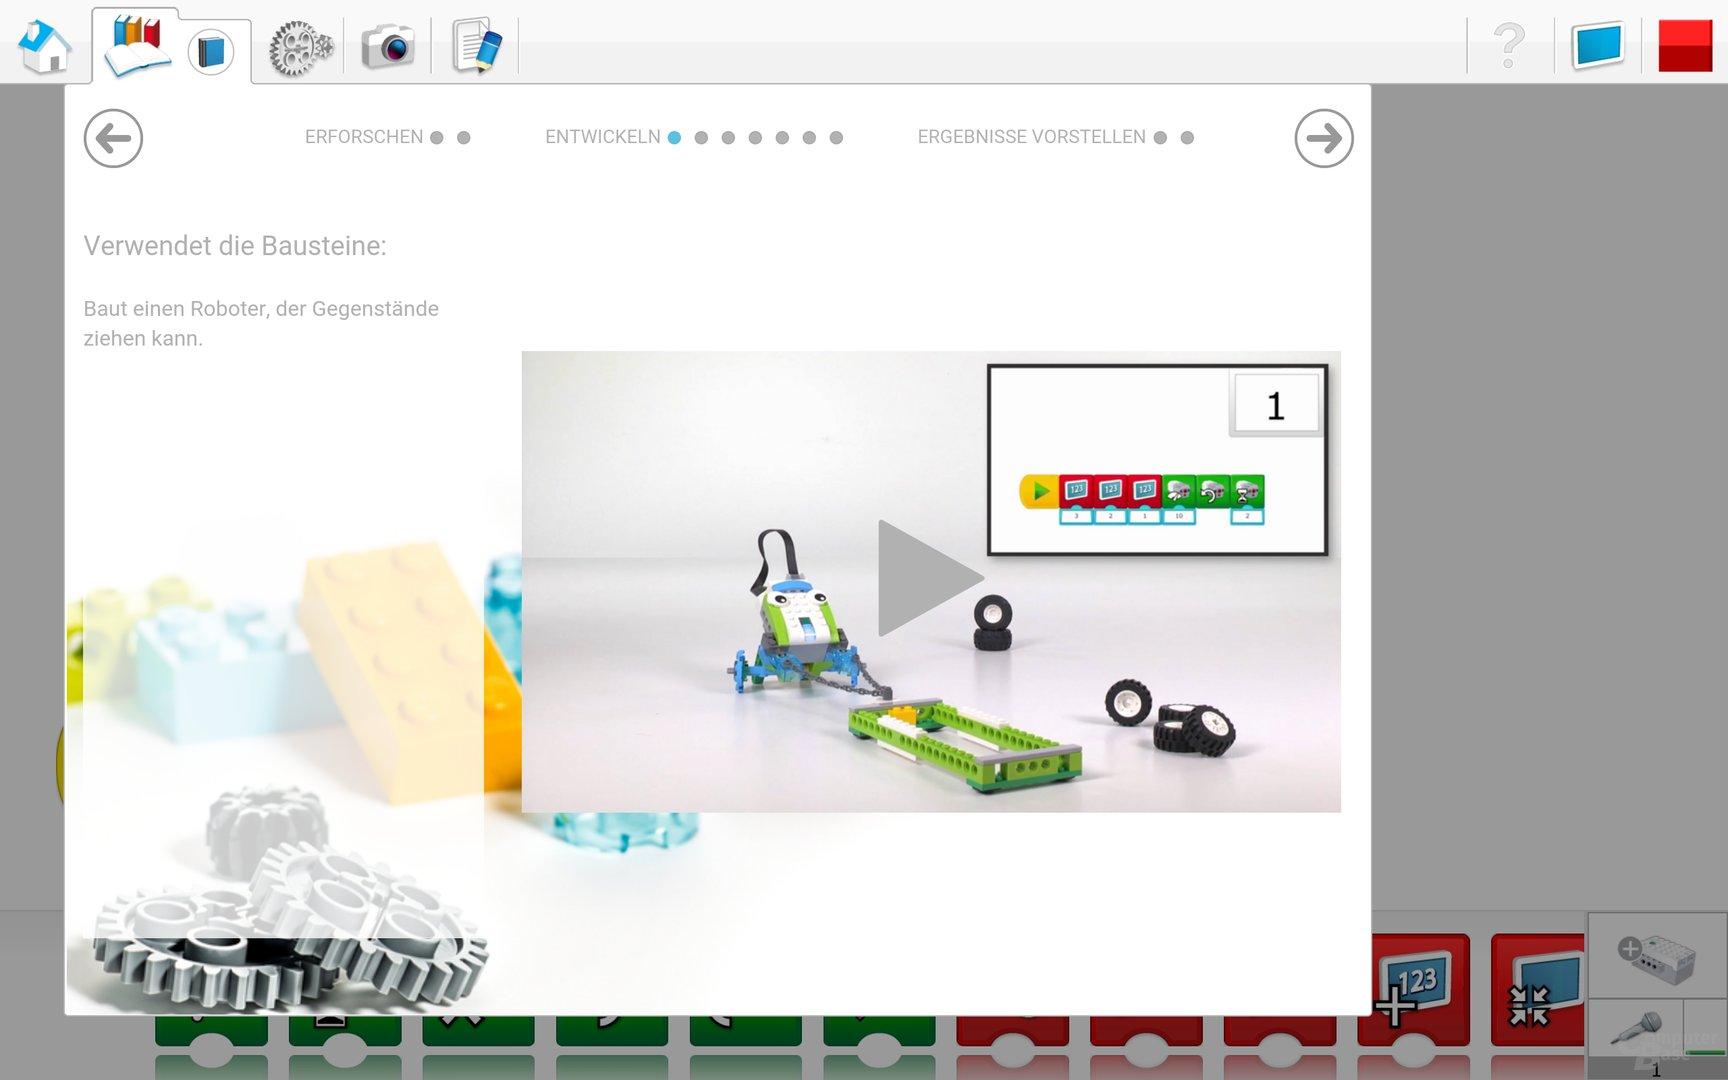 Lego WeDo 2.0 Android App – Entwickeln